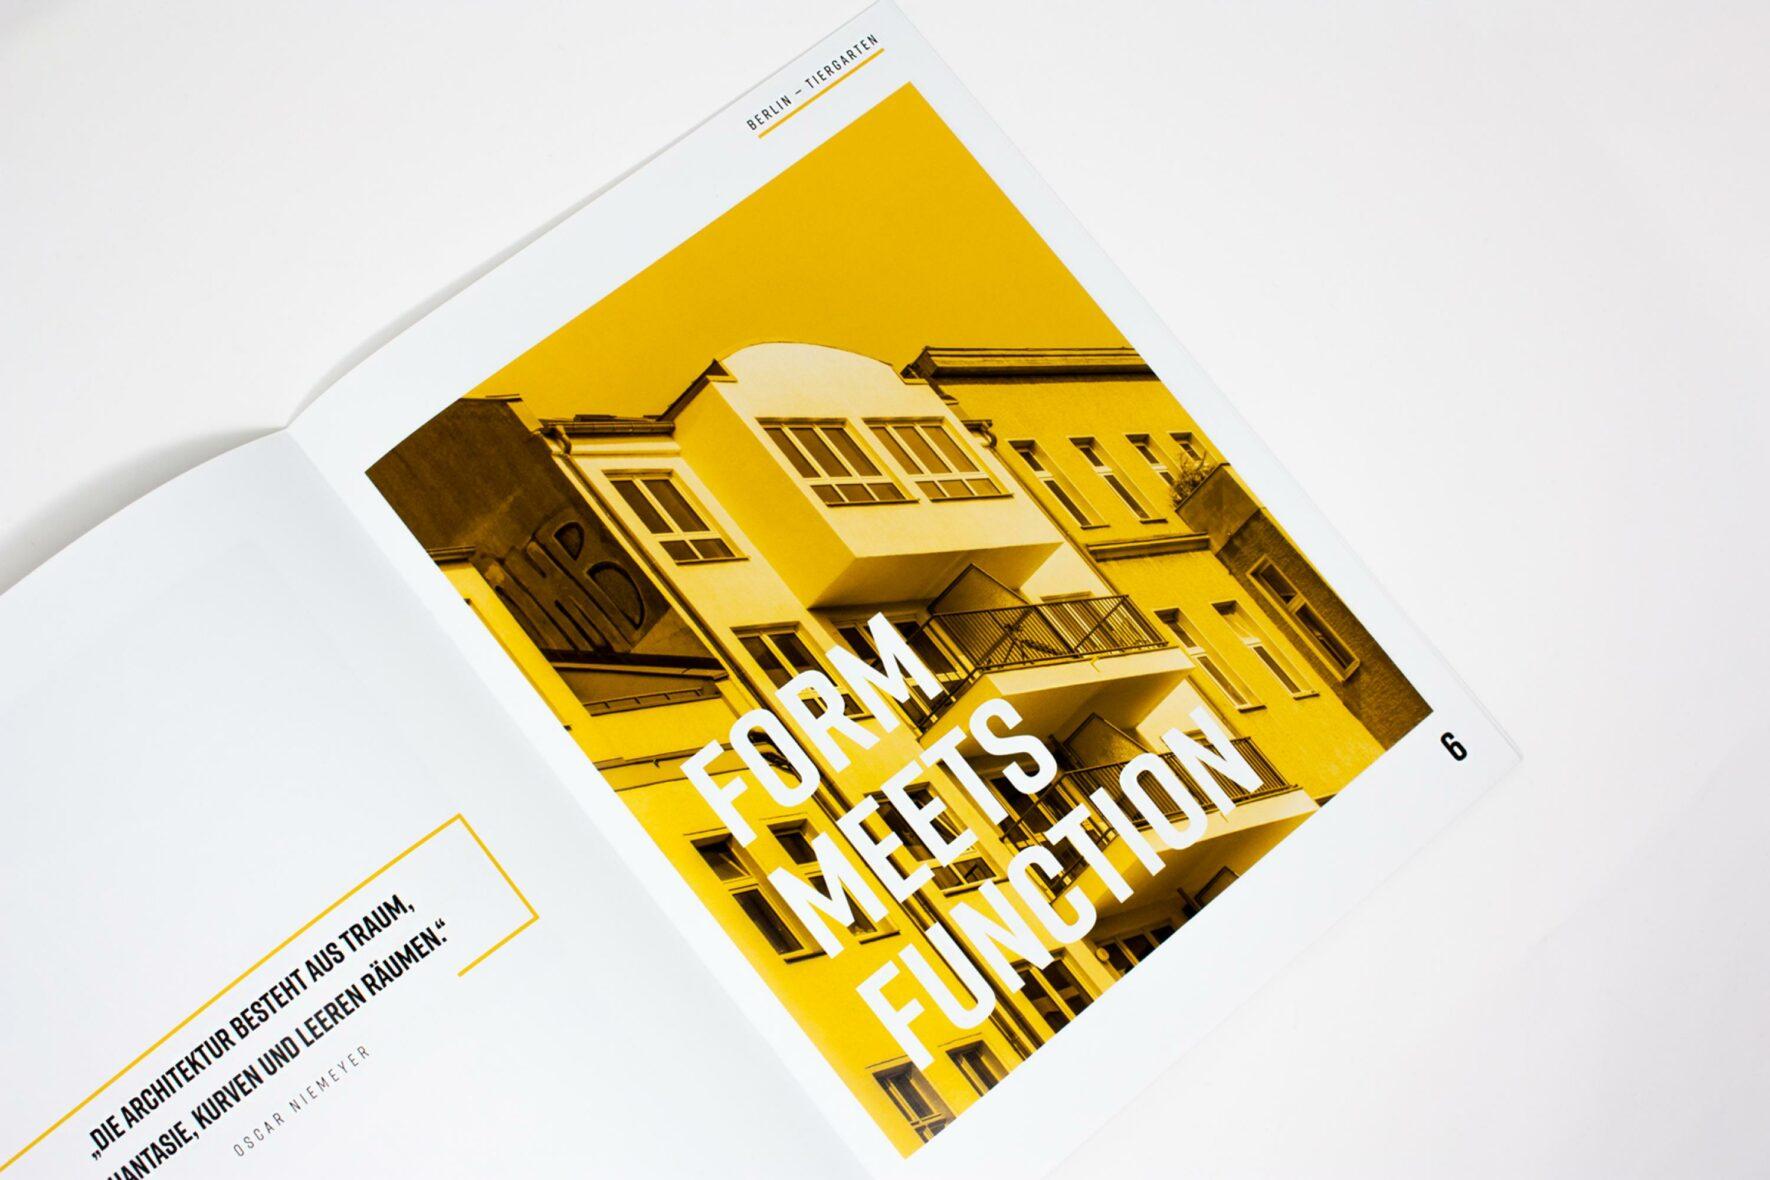 Immobilienbranding-Luetzow-Trendcity-Broschüre-FORMLOS-berlin-Print_MG_8346